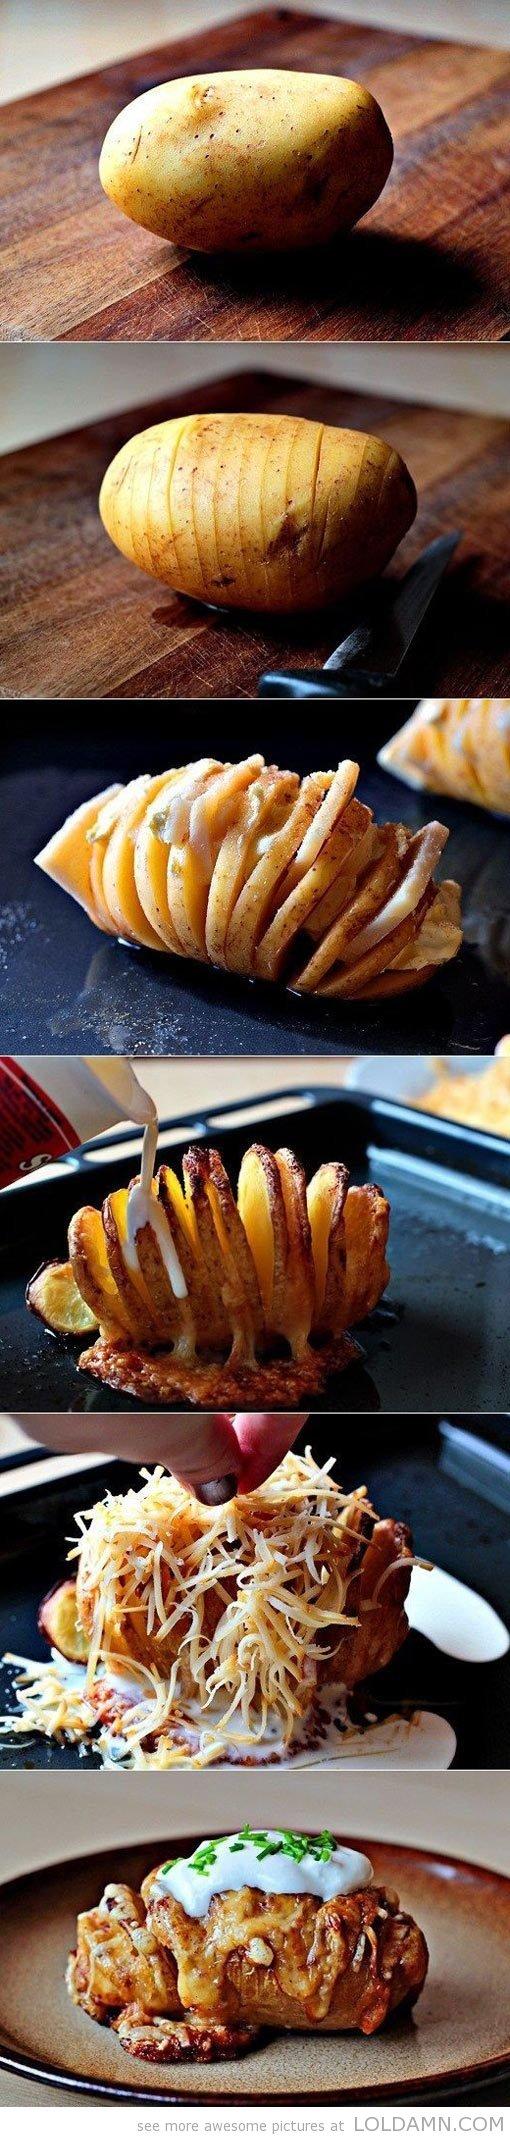 The perfect baked potatoe. You're welcome. potatoe baked Food